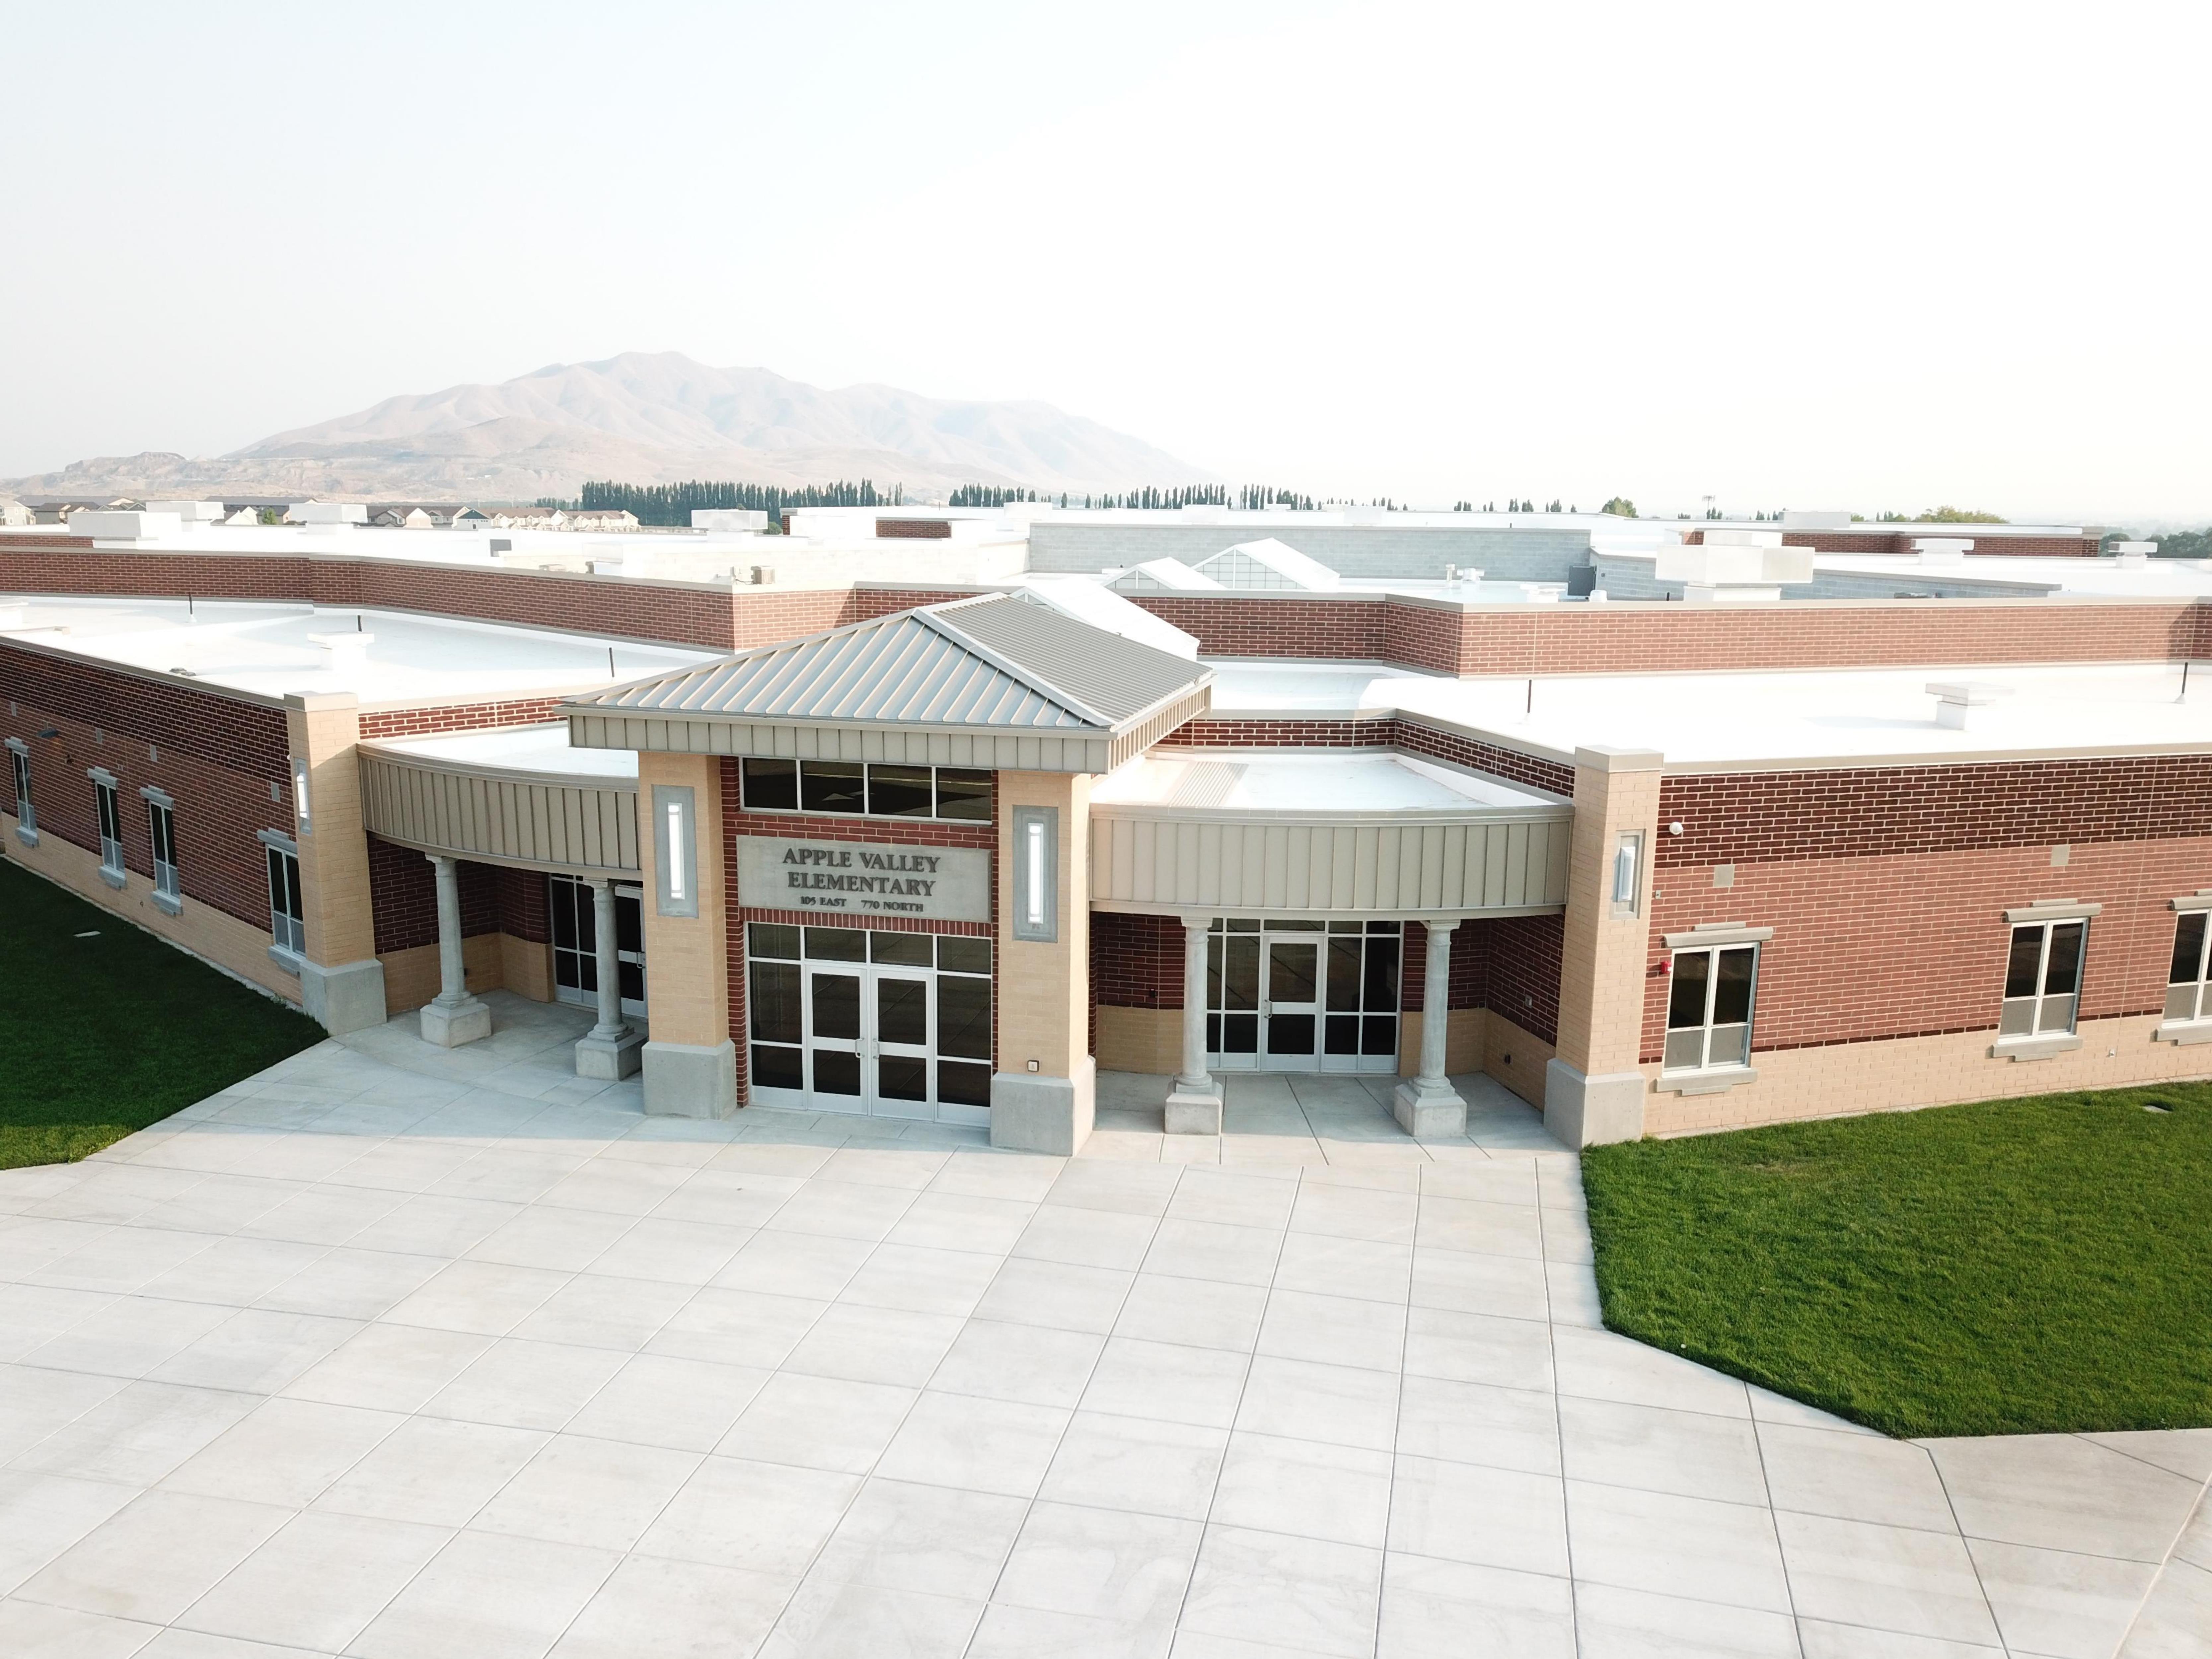 Apple Valley Elementary